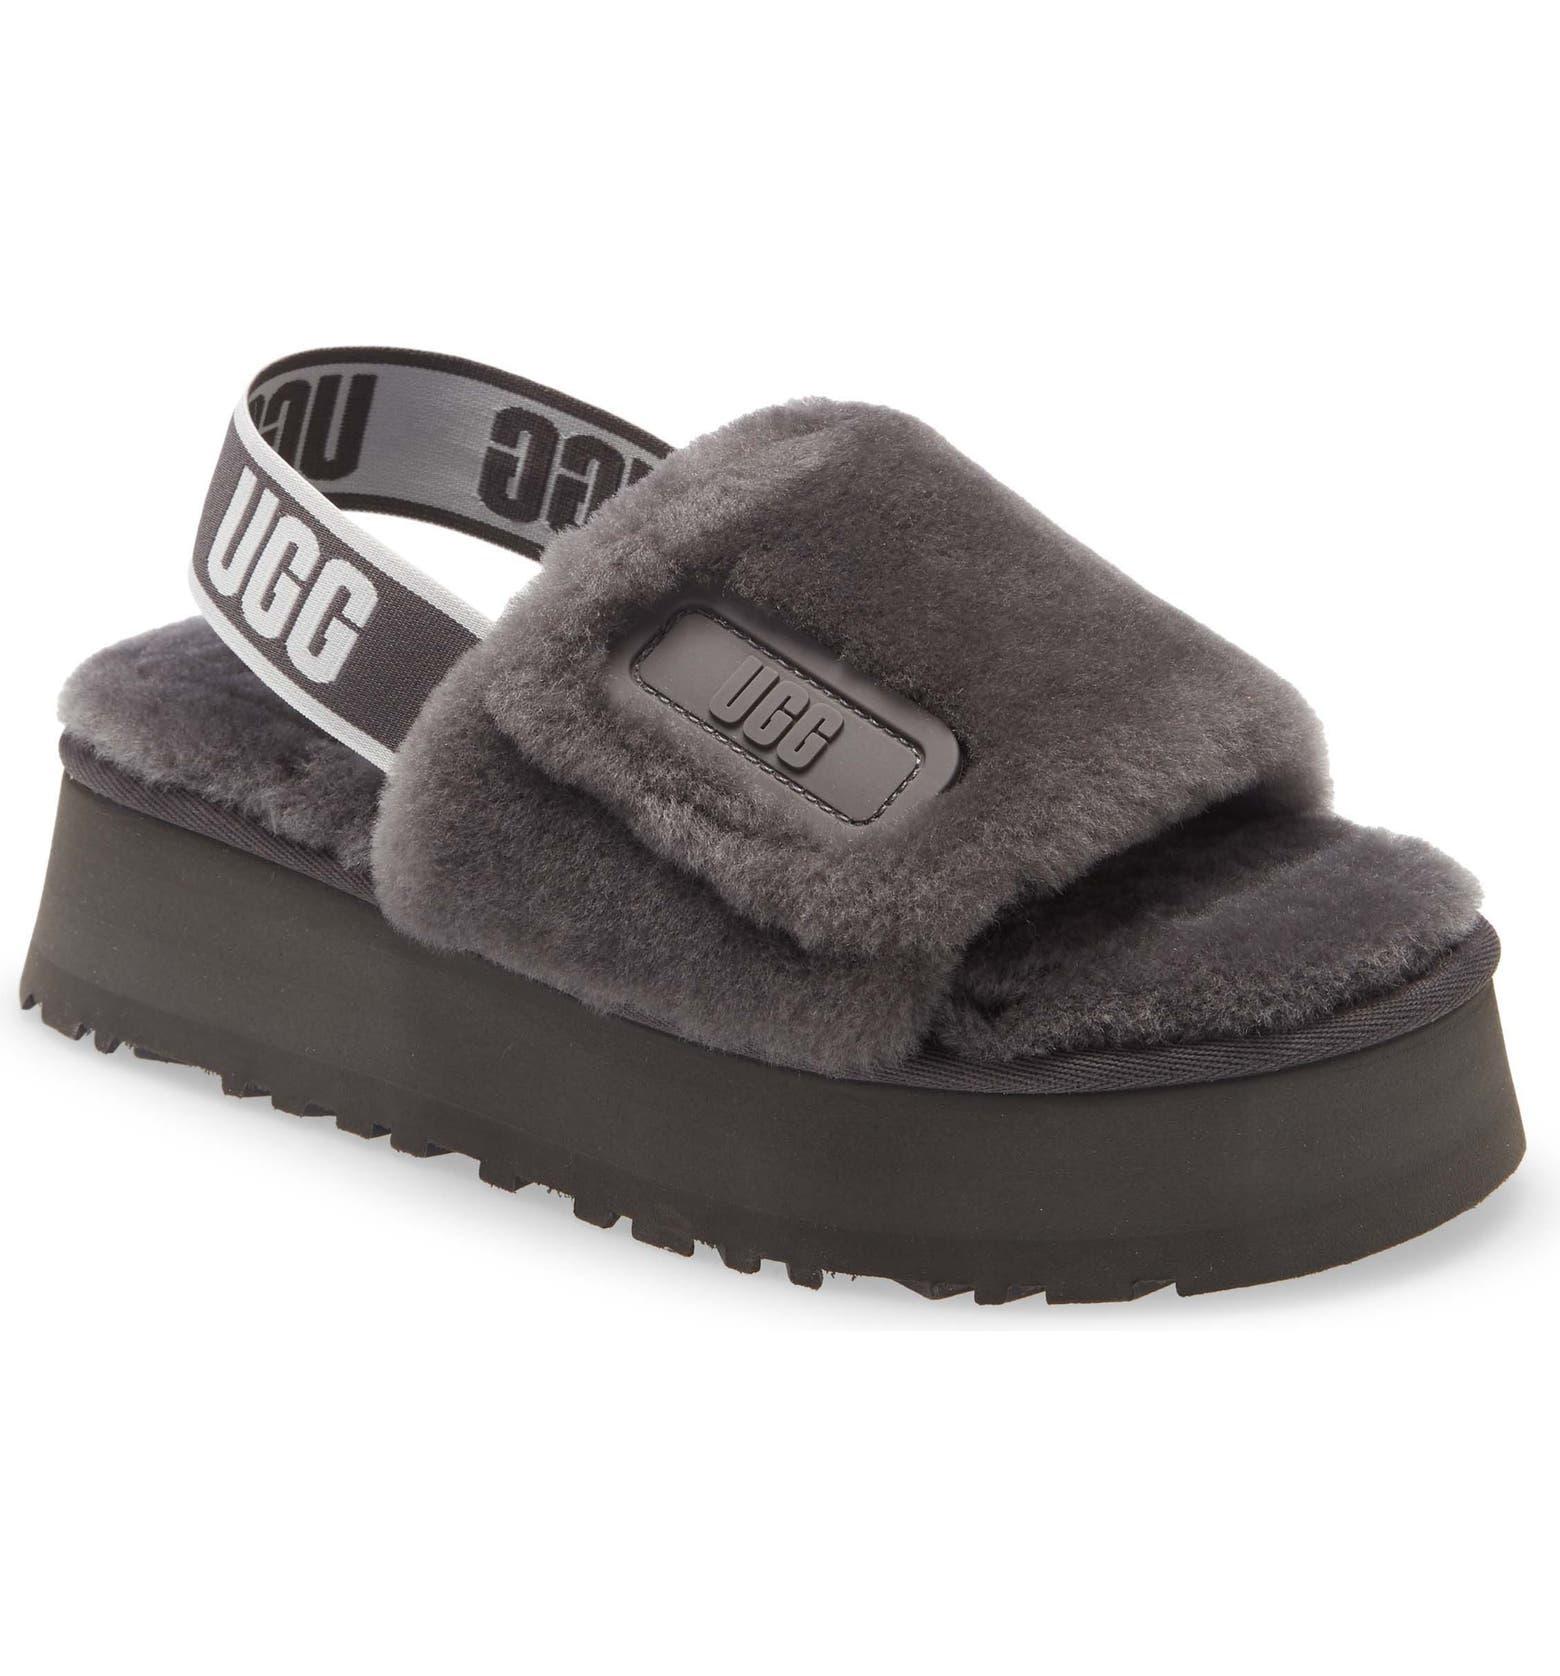 ugg slippers oscars 2021